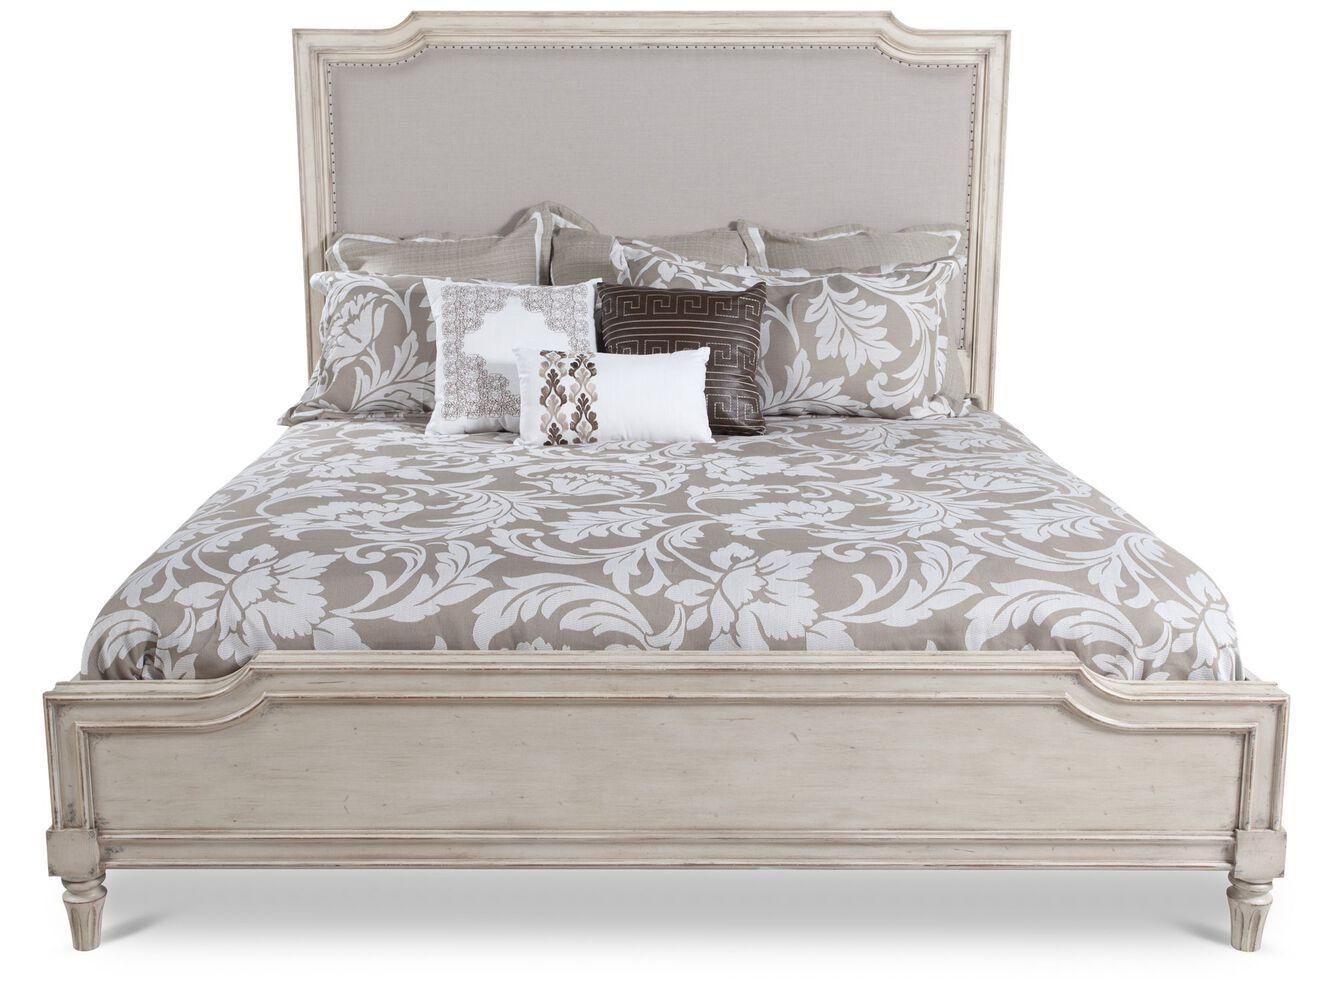 Stanley classic portfolio european cottage upholstered bed - European cottage bedroom furniture ...